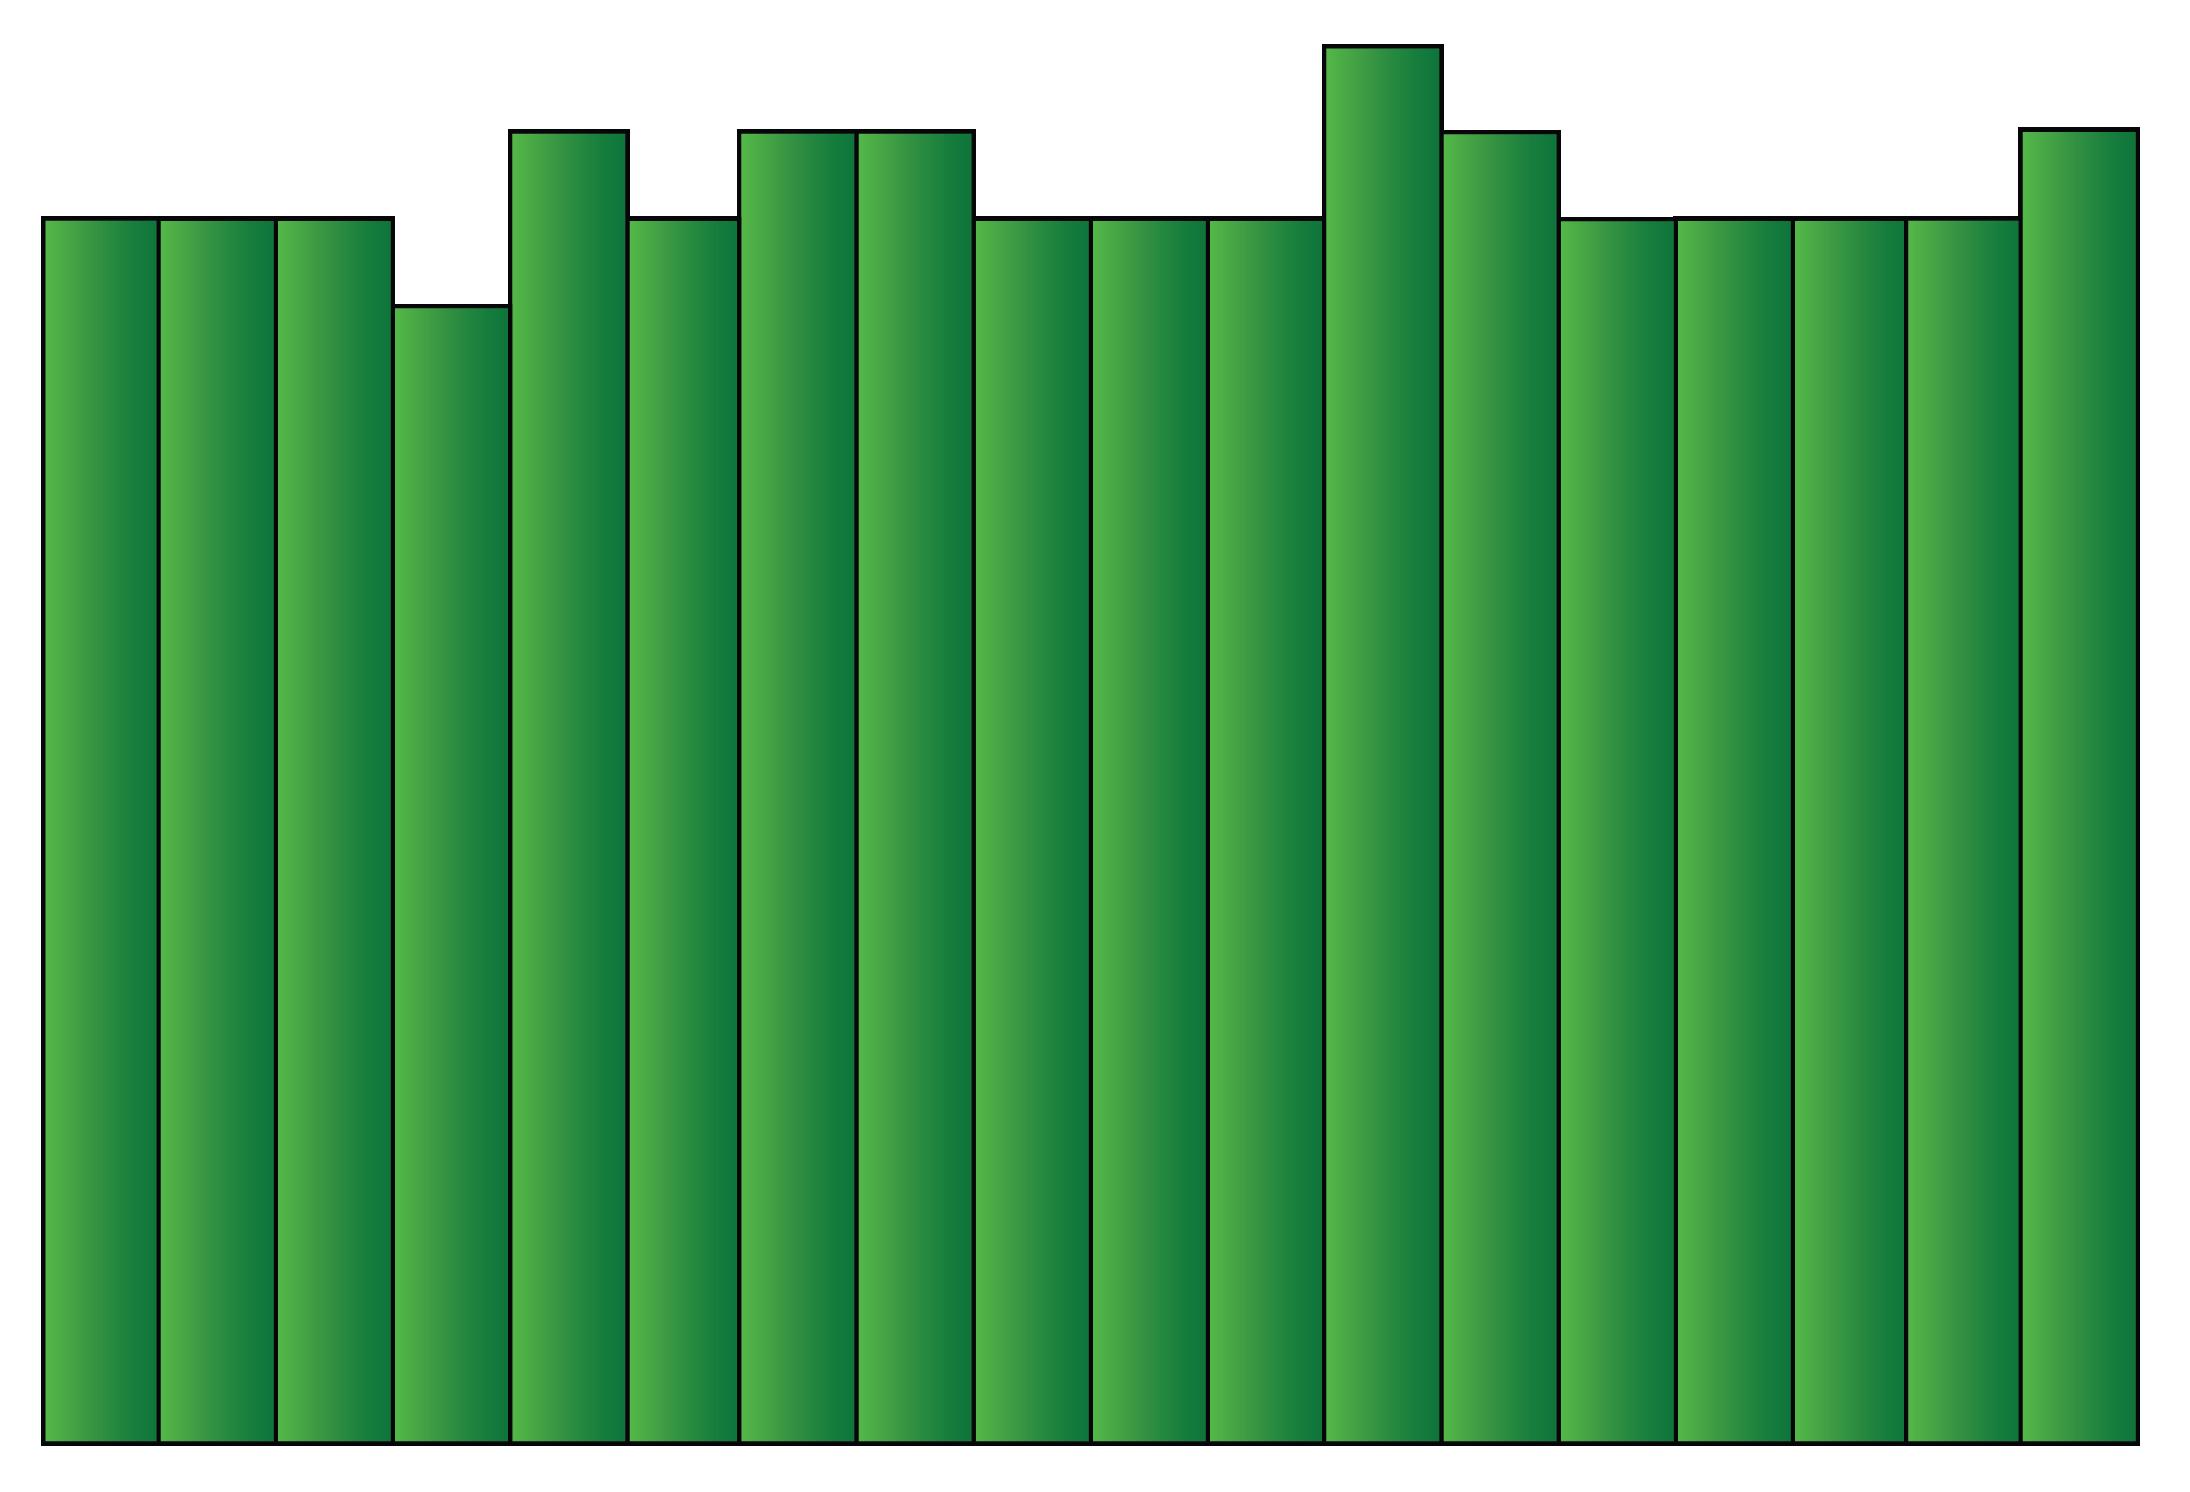 uniform histogram shape